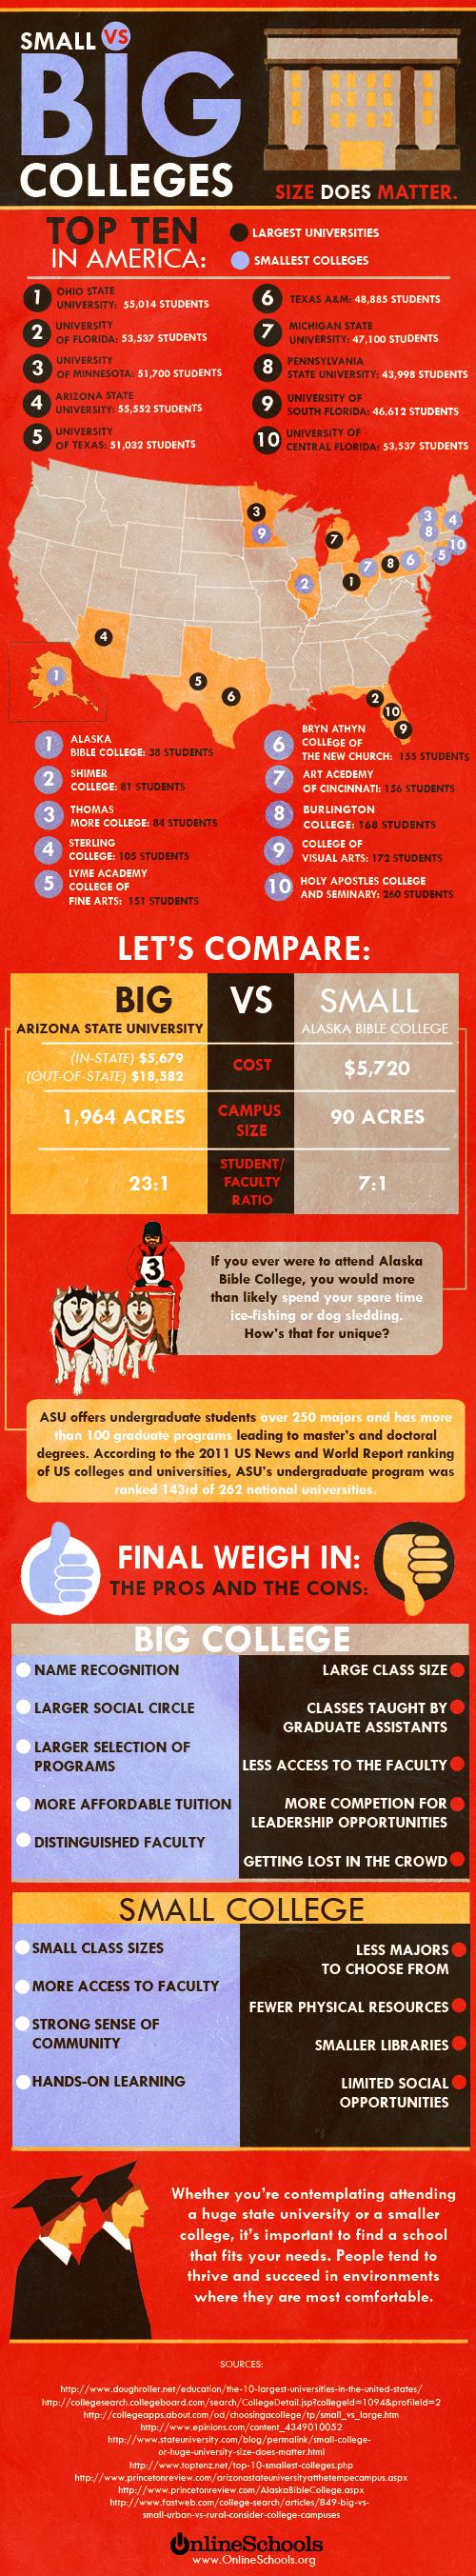 Small vs. Big Colleges